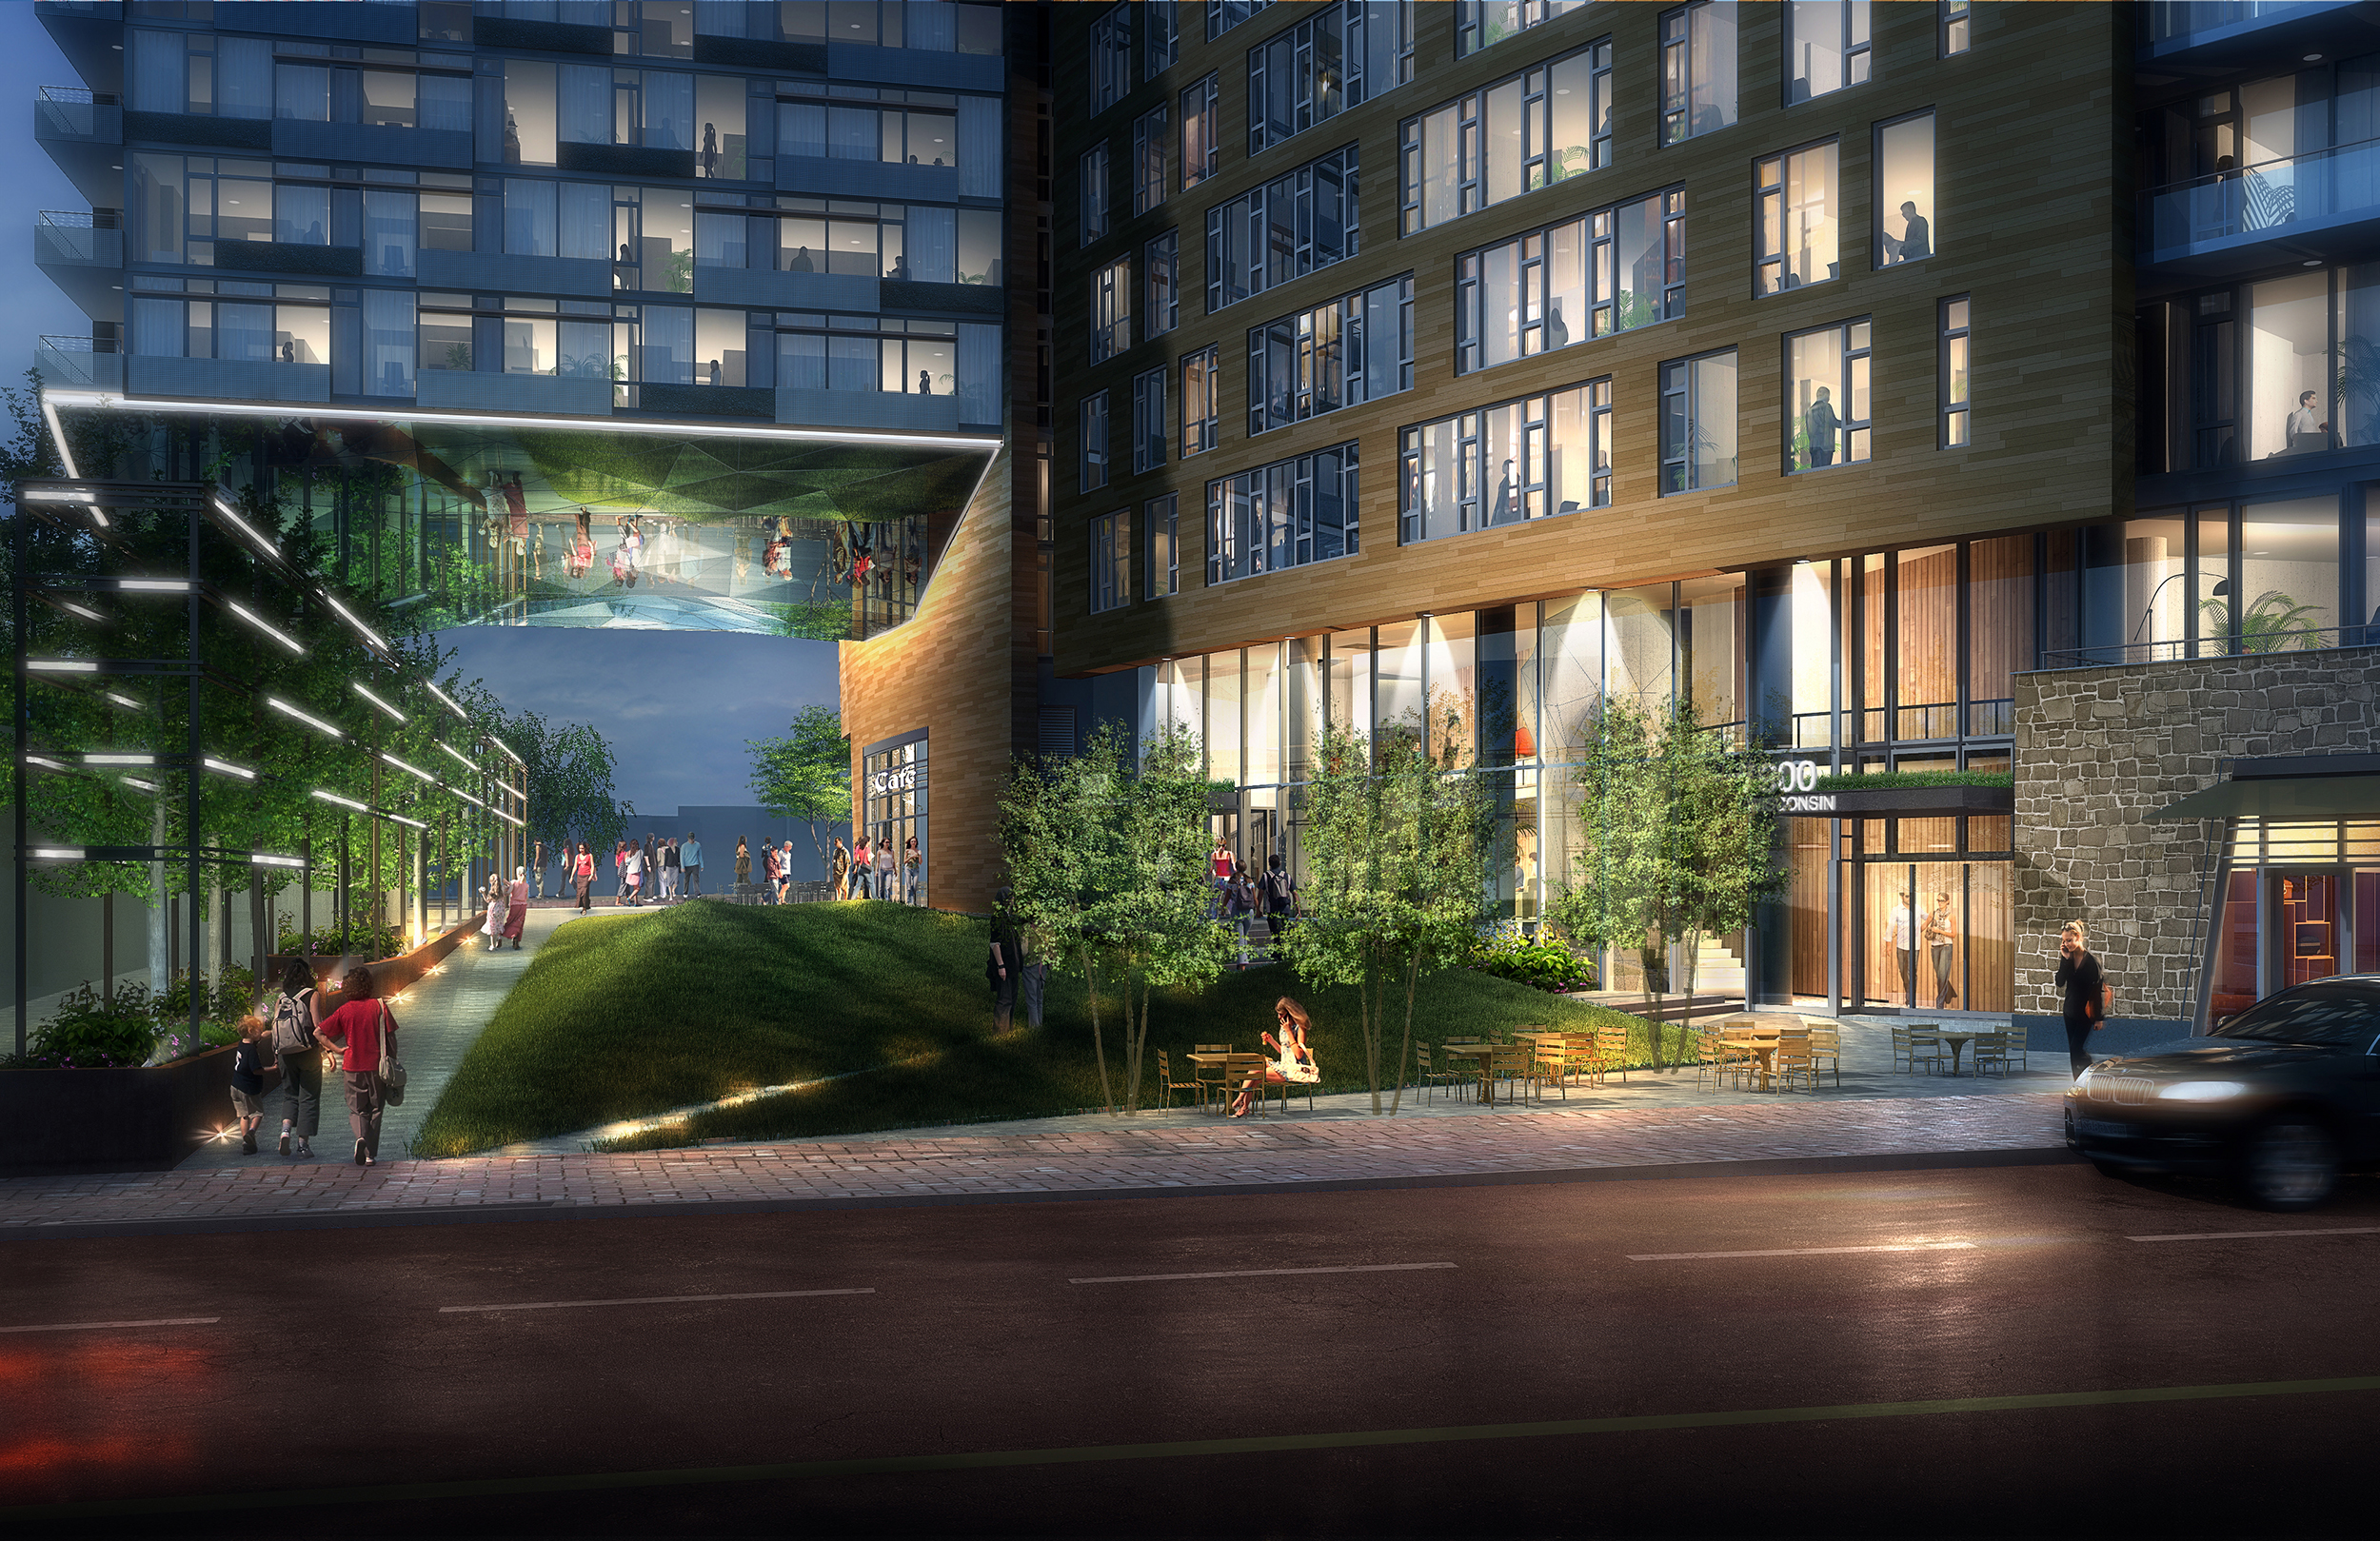 Landscape architecture bureau